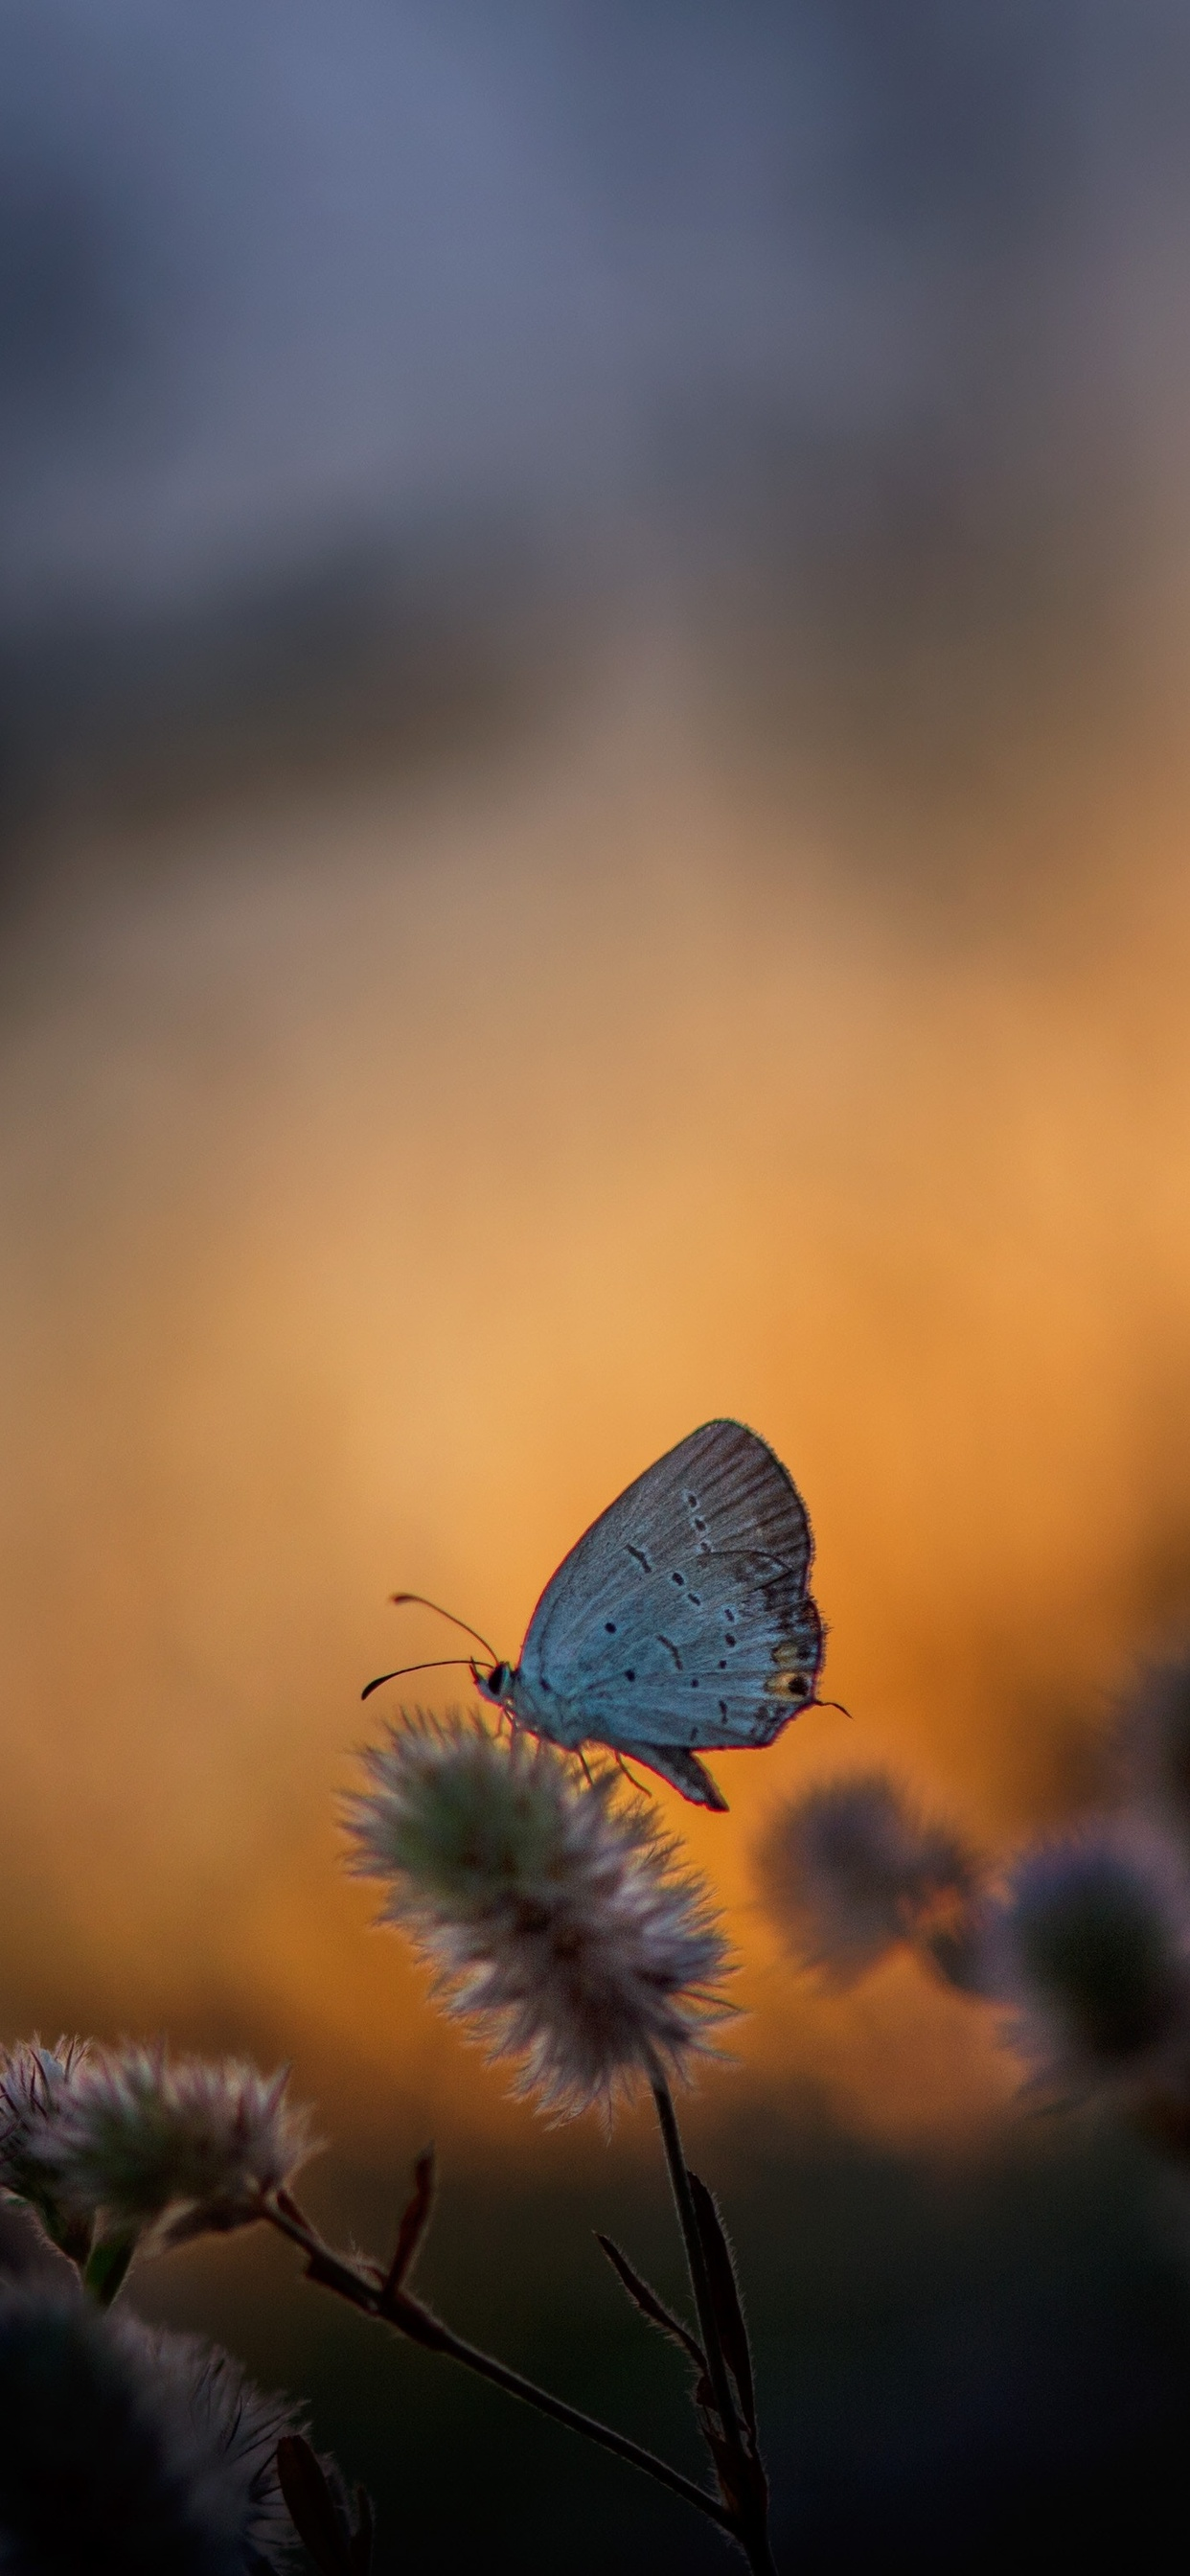 butterfly-sitting-on-plant-5k-v9.jpg